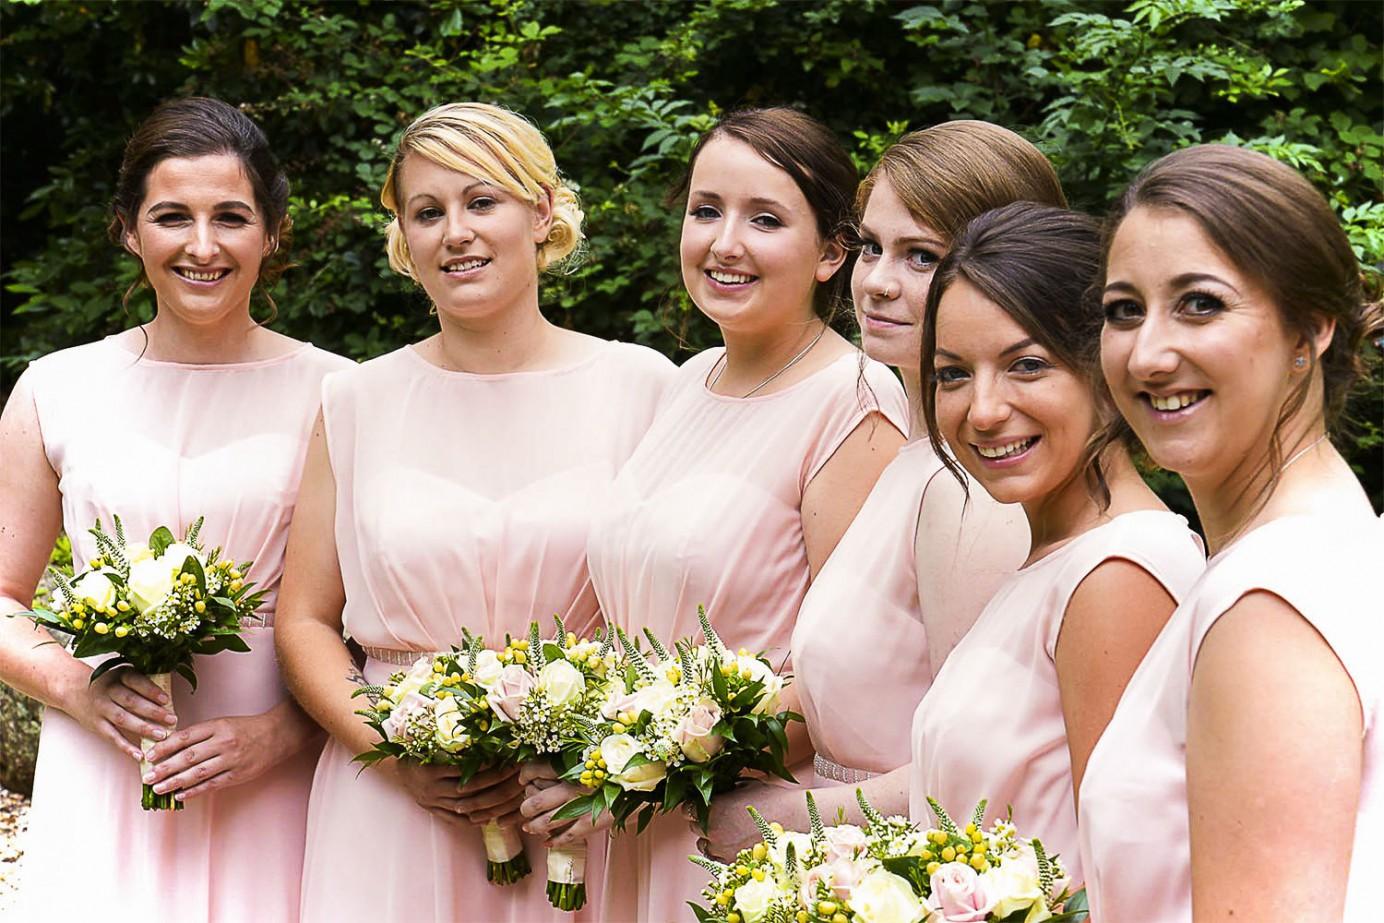 Lucy's Wedding Image 3